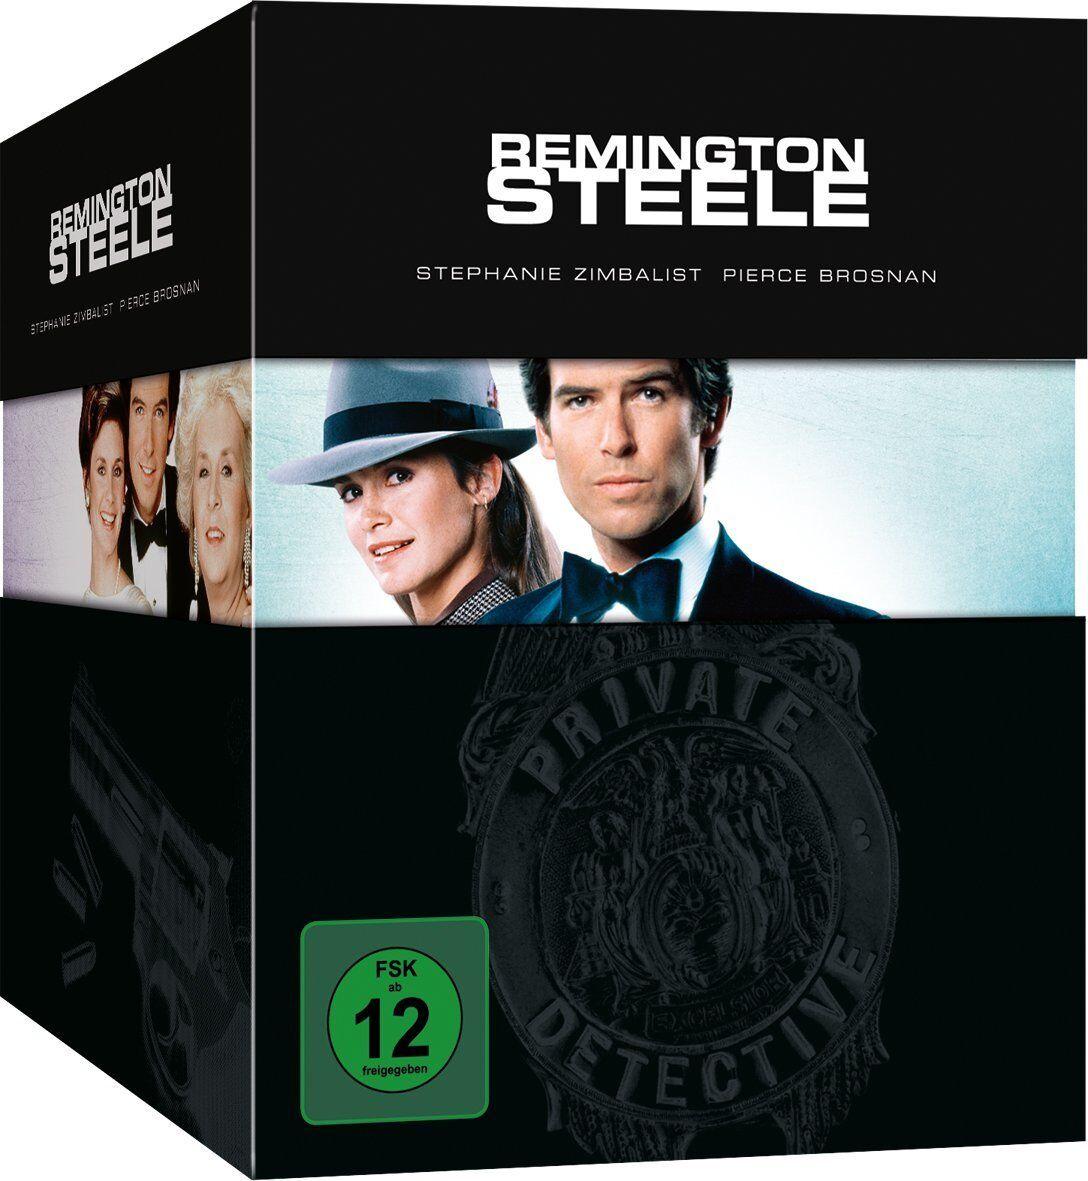 Remington Steele - Die komplette Serie, Collector's Edition, 30 DVD NEU + OVP!